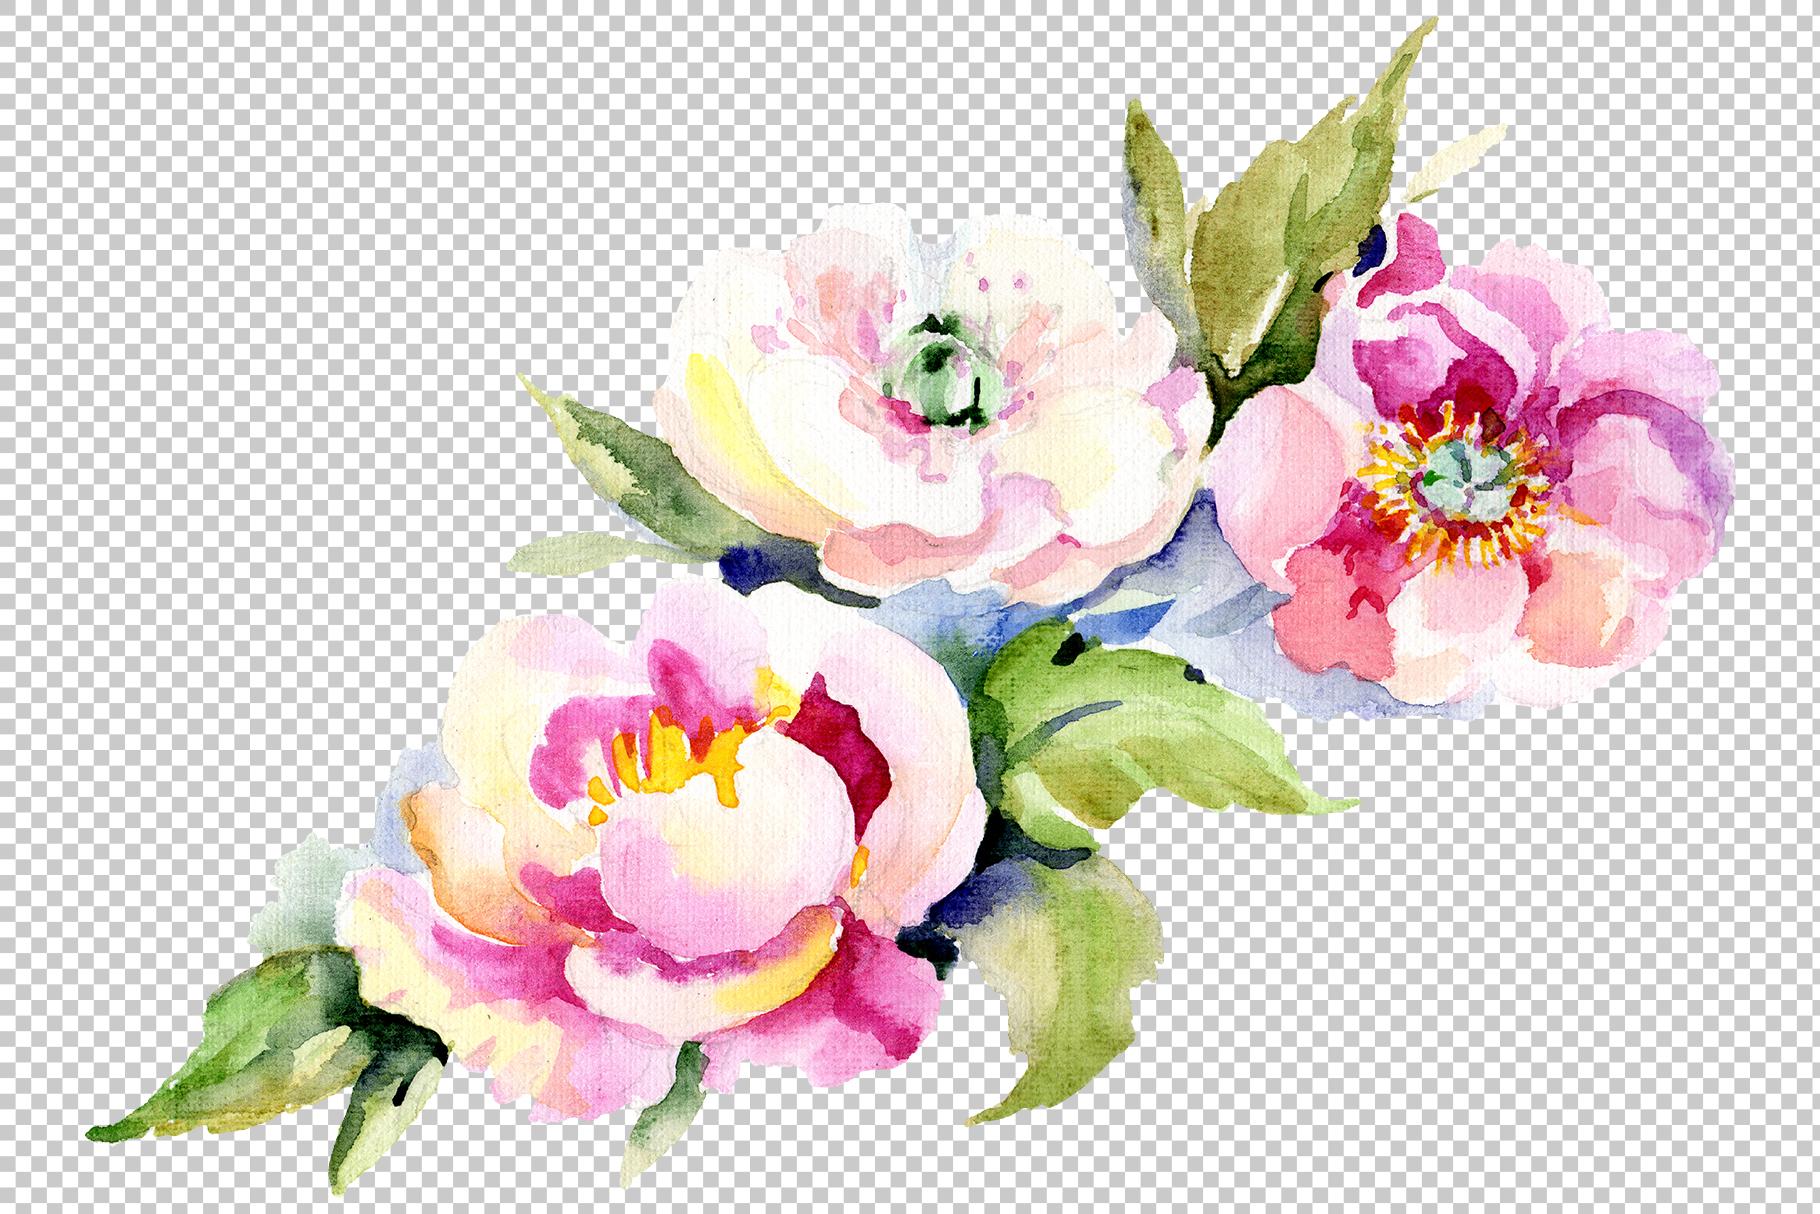 Bouquet Romantic Watercolor png example image 3